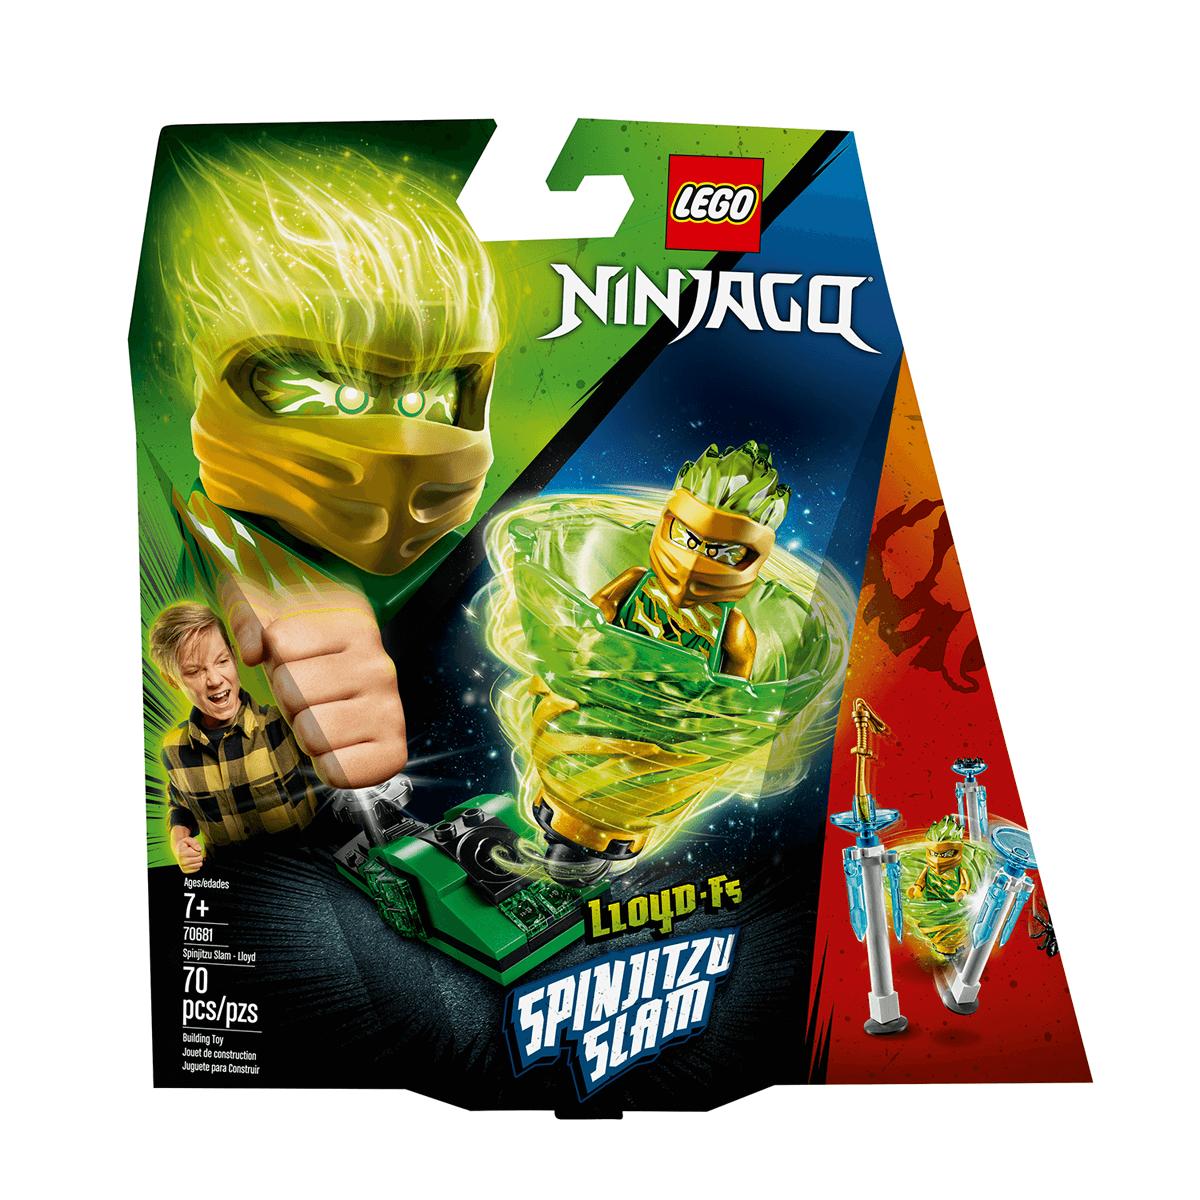 new images of autumn shoes new high quality LEGO Ninjago Spinjitzu Slam - Lloyd - 70681